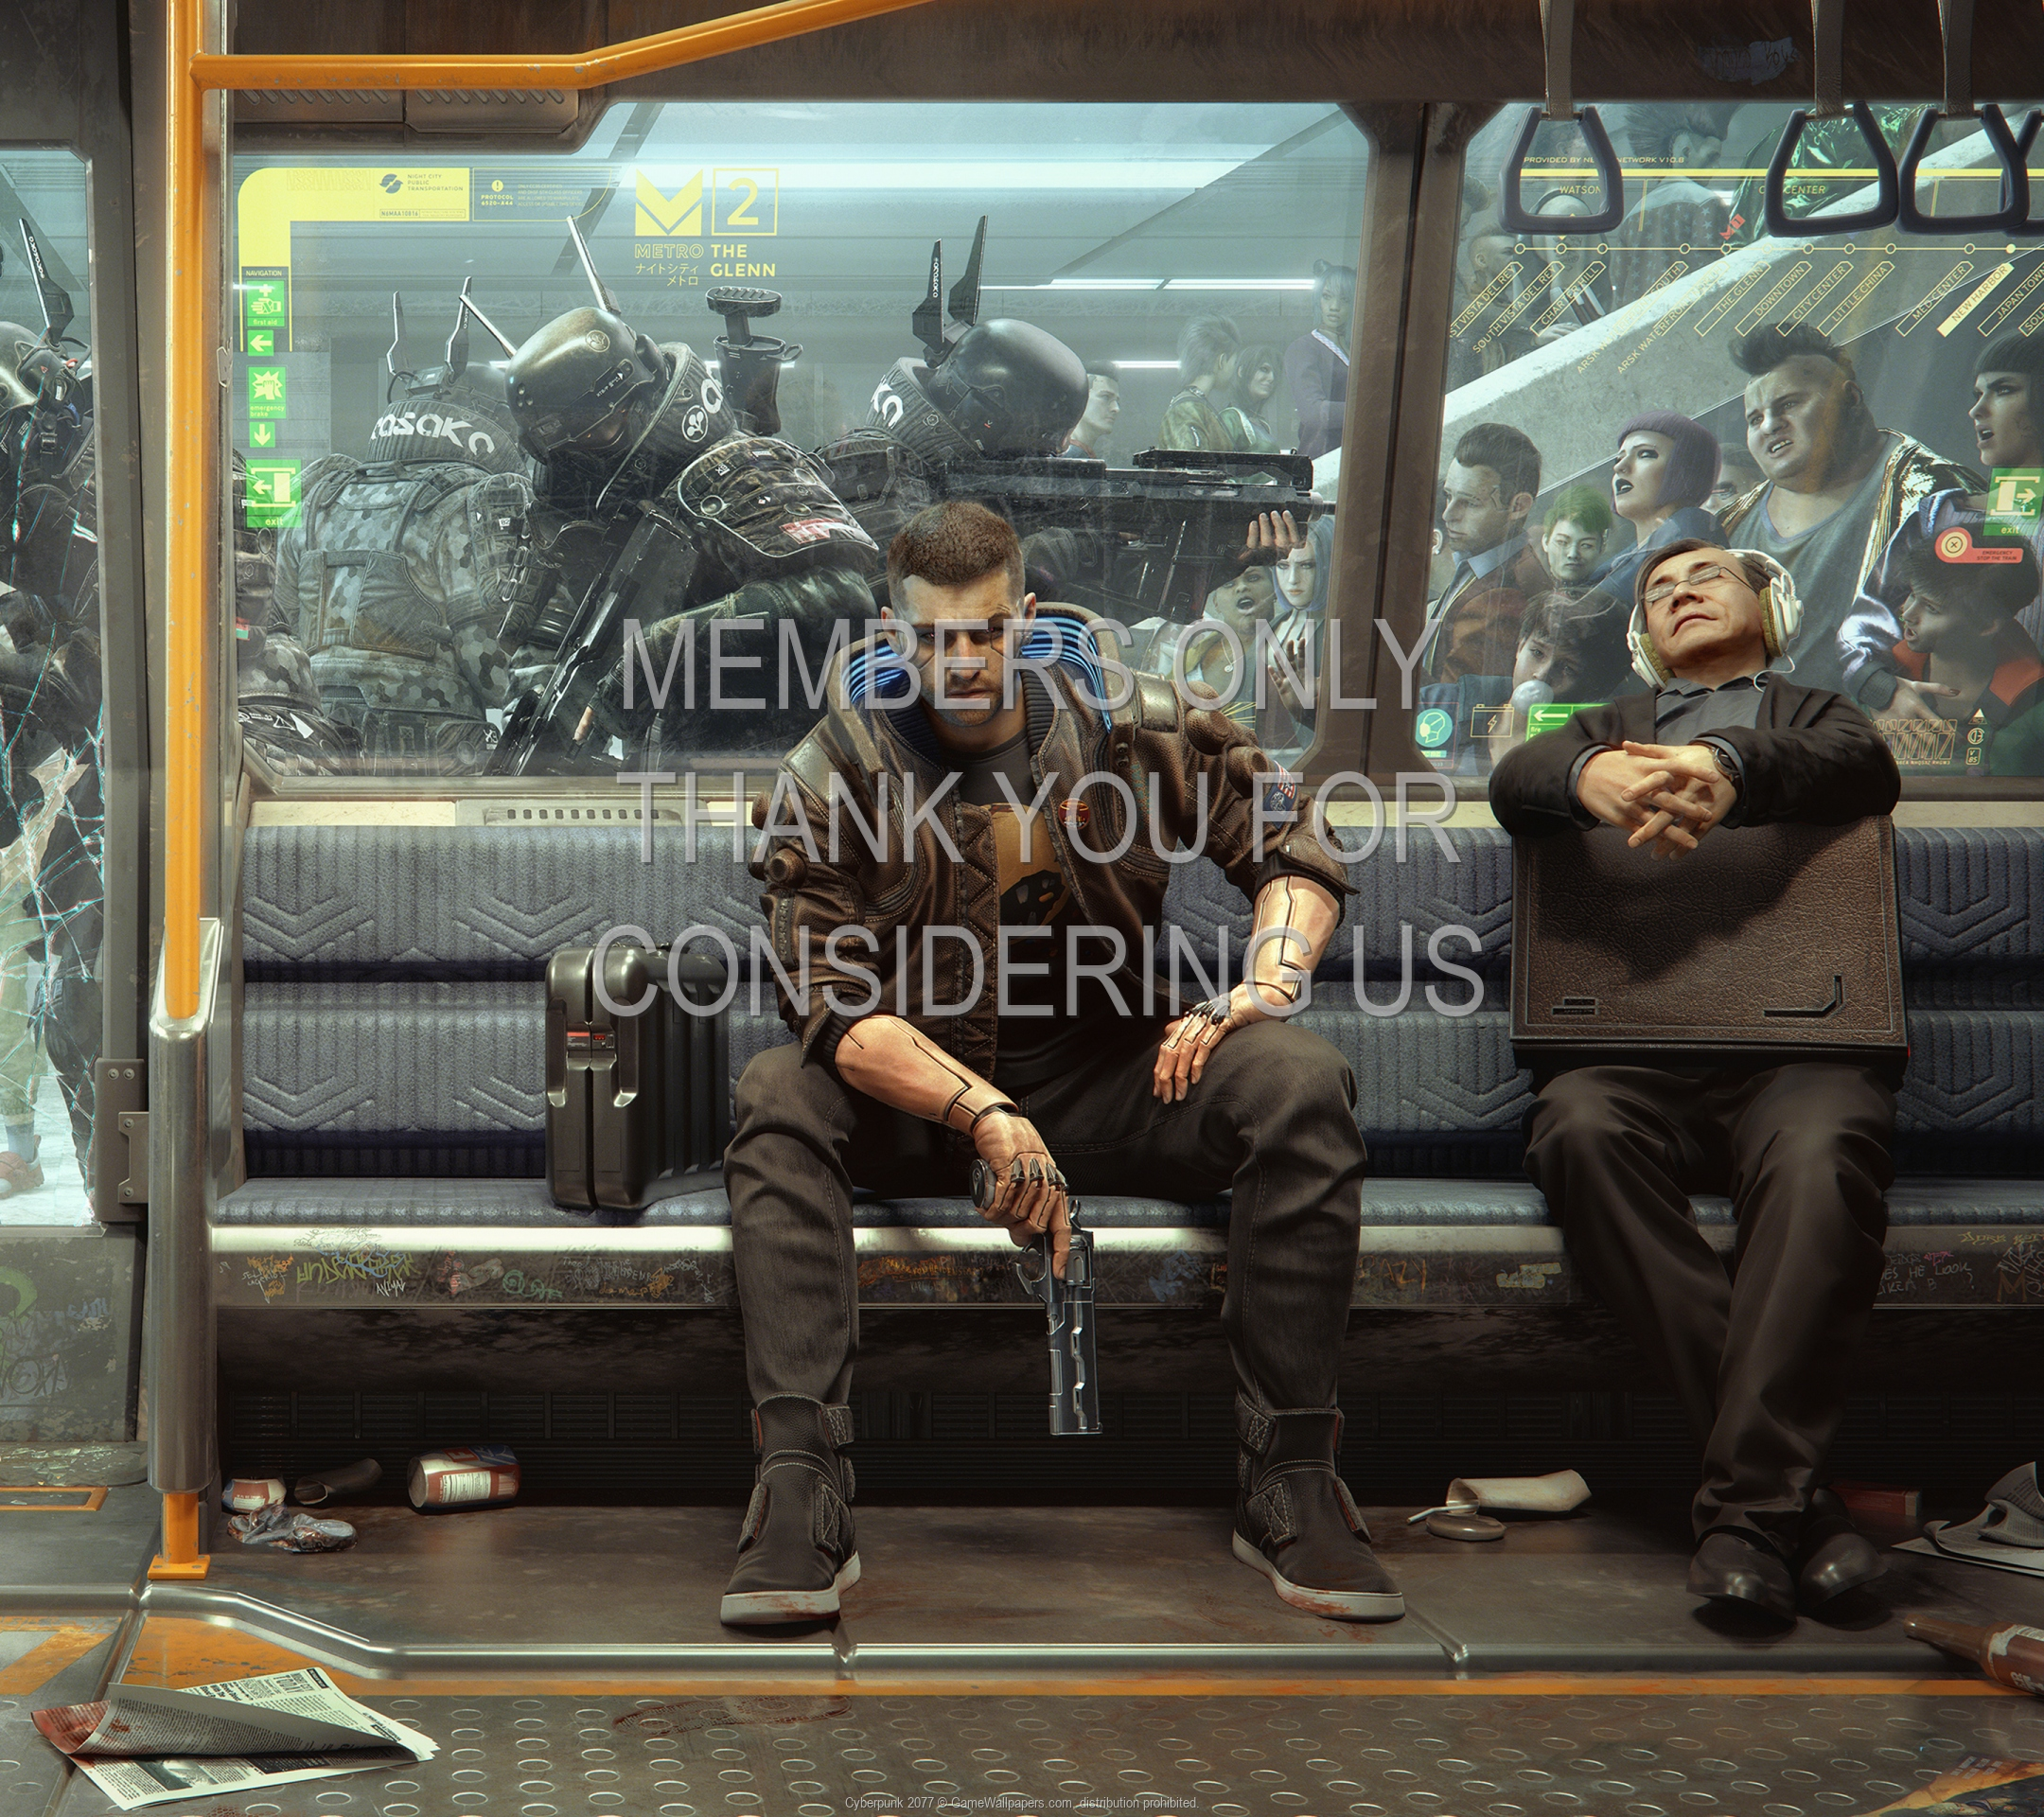 Cyberpunk 2077 1920x1080 Mobile fond d'écran 28